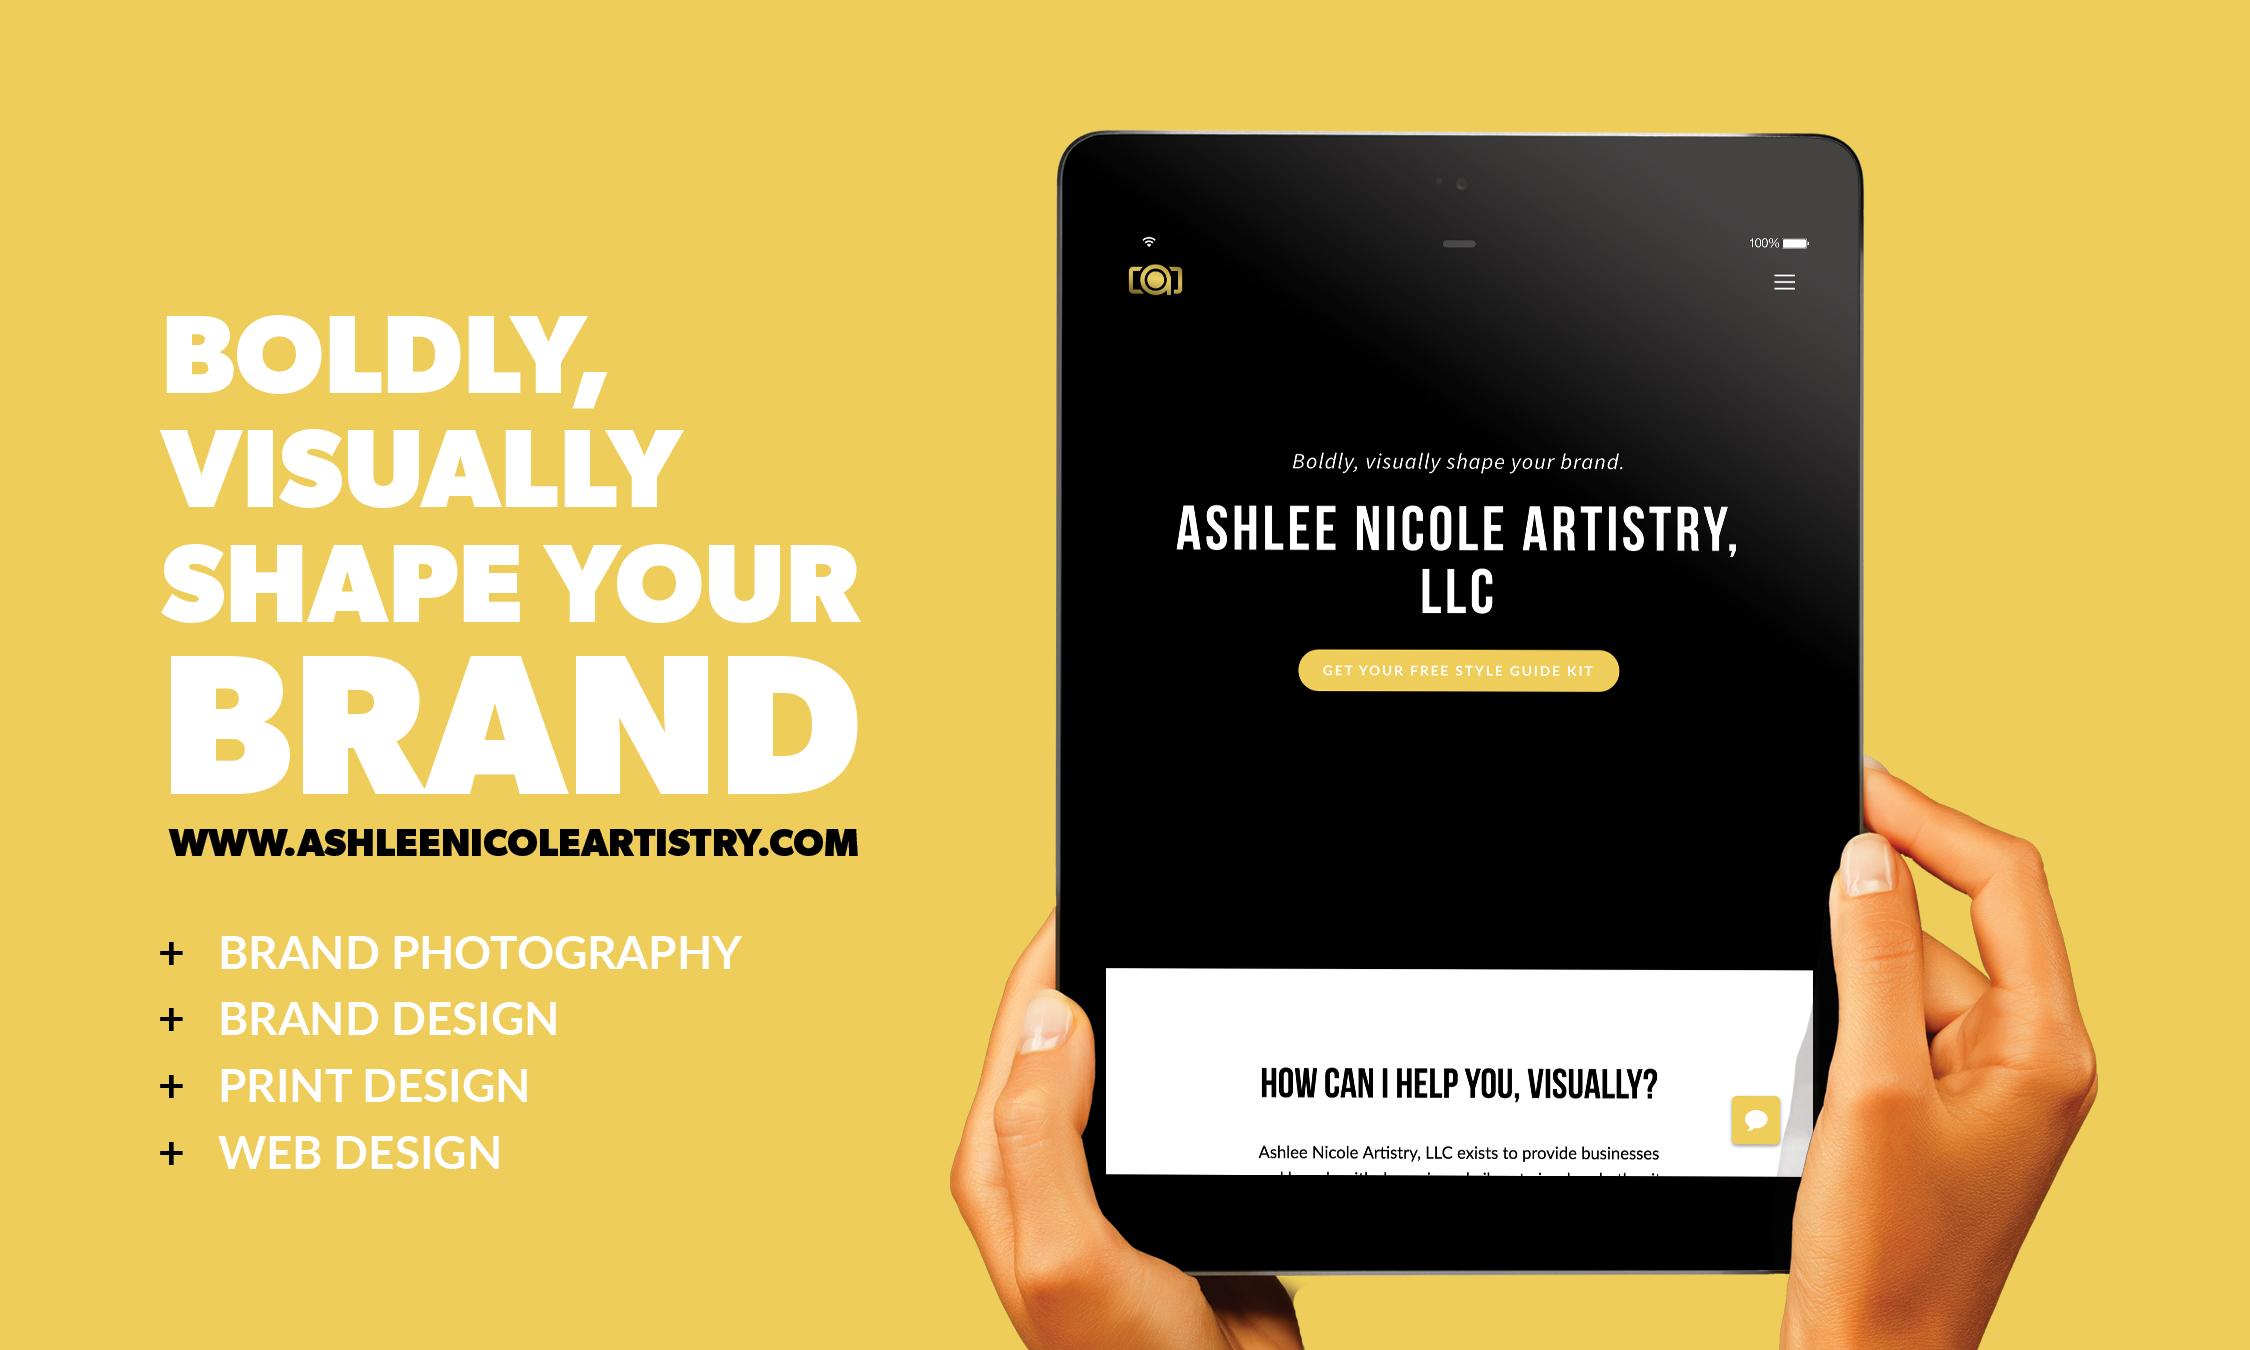 AshleeNicoleArtistryLLC_halfpage_ad.jpg